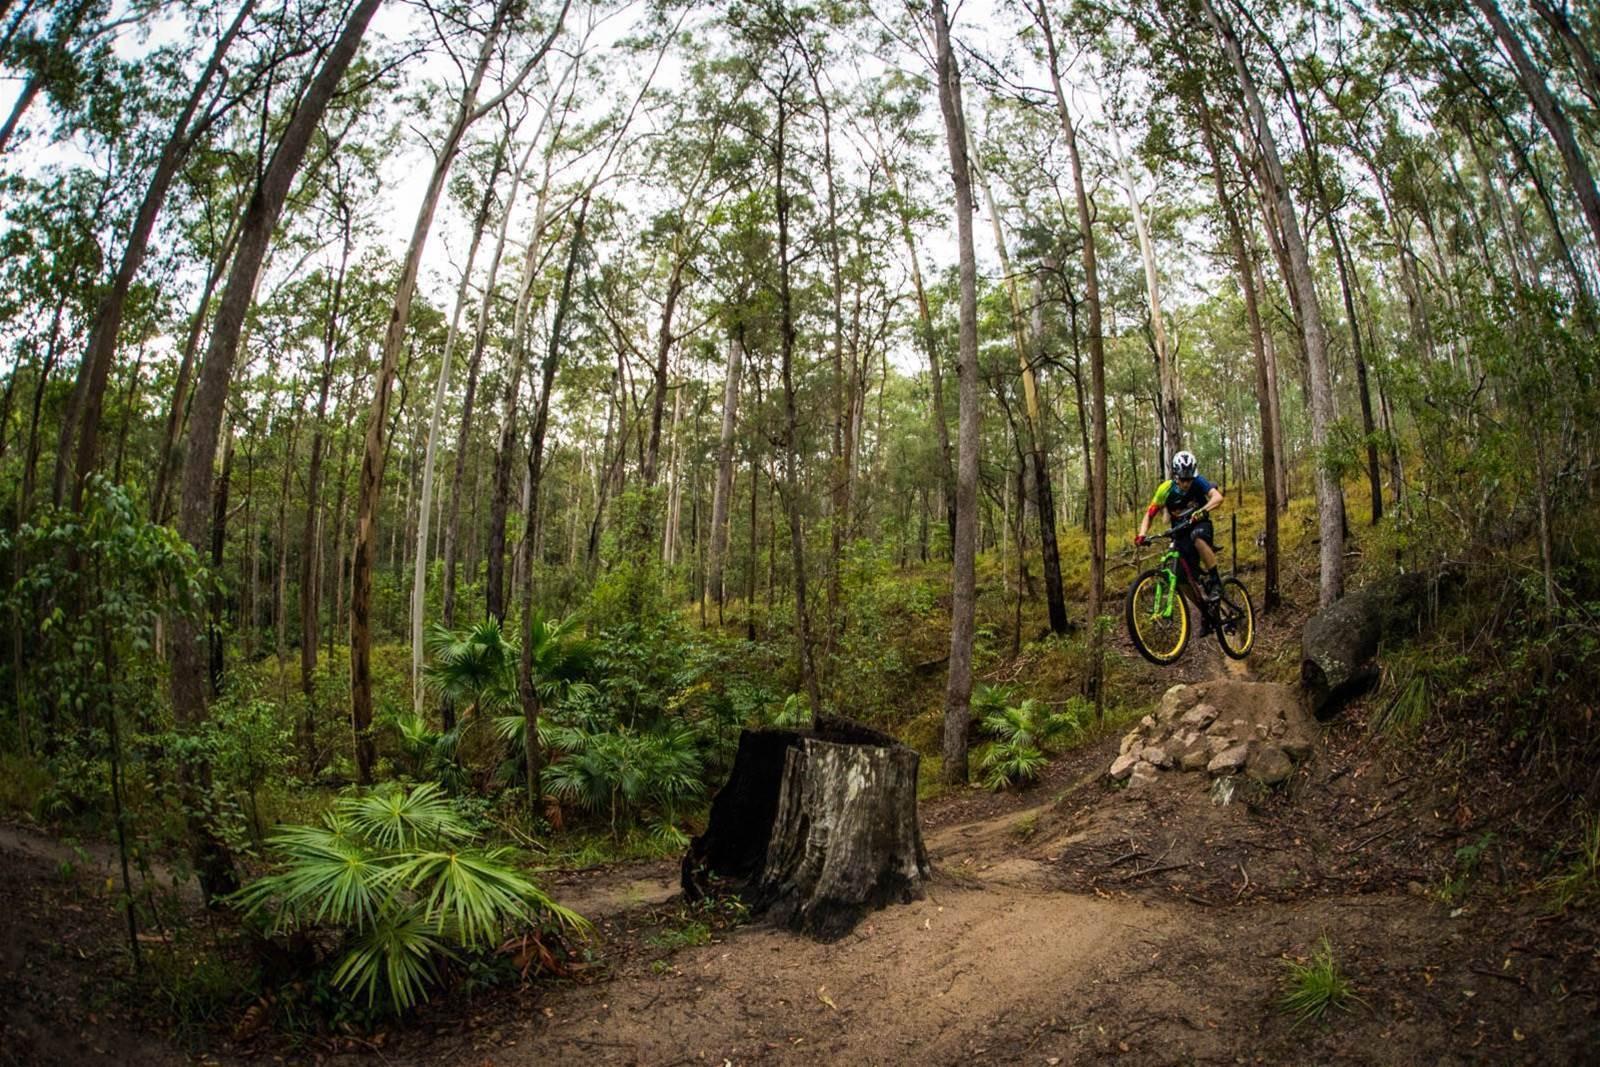 Queensland's mountain bike hot spots